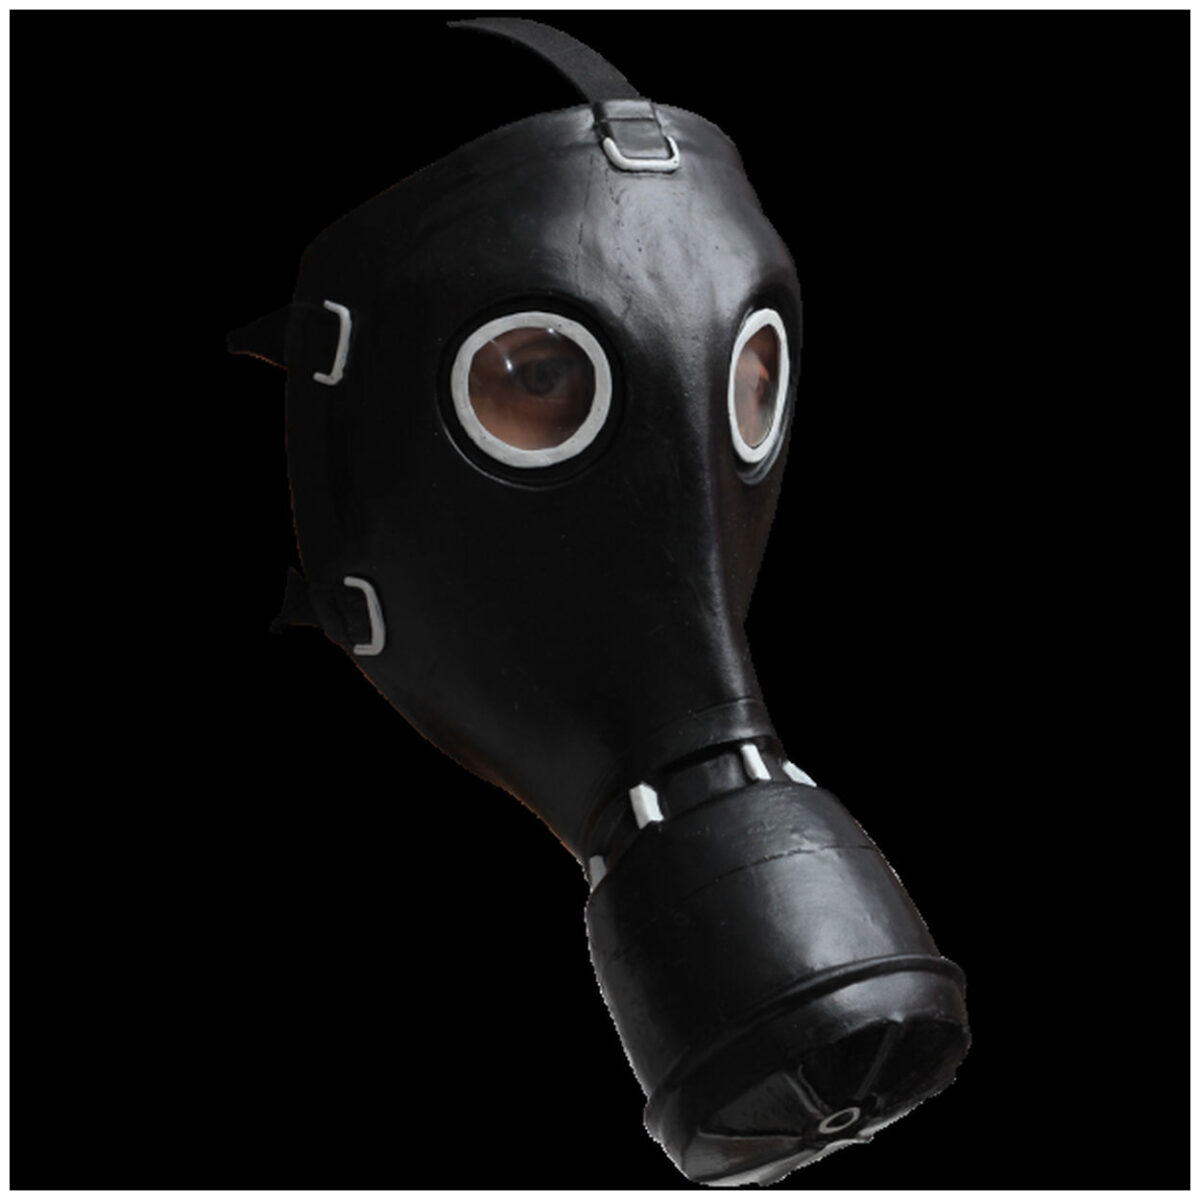 Gp-5-gas-mask-black